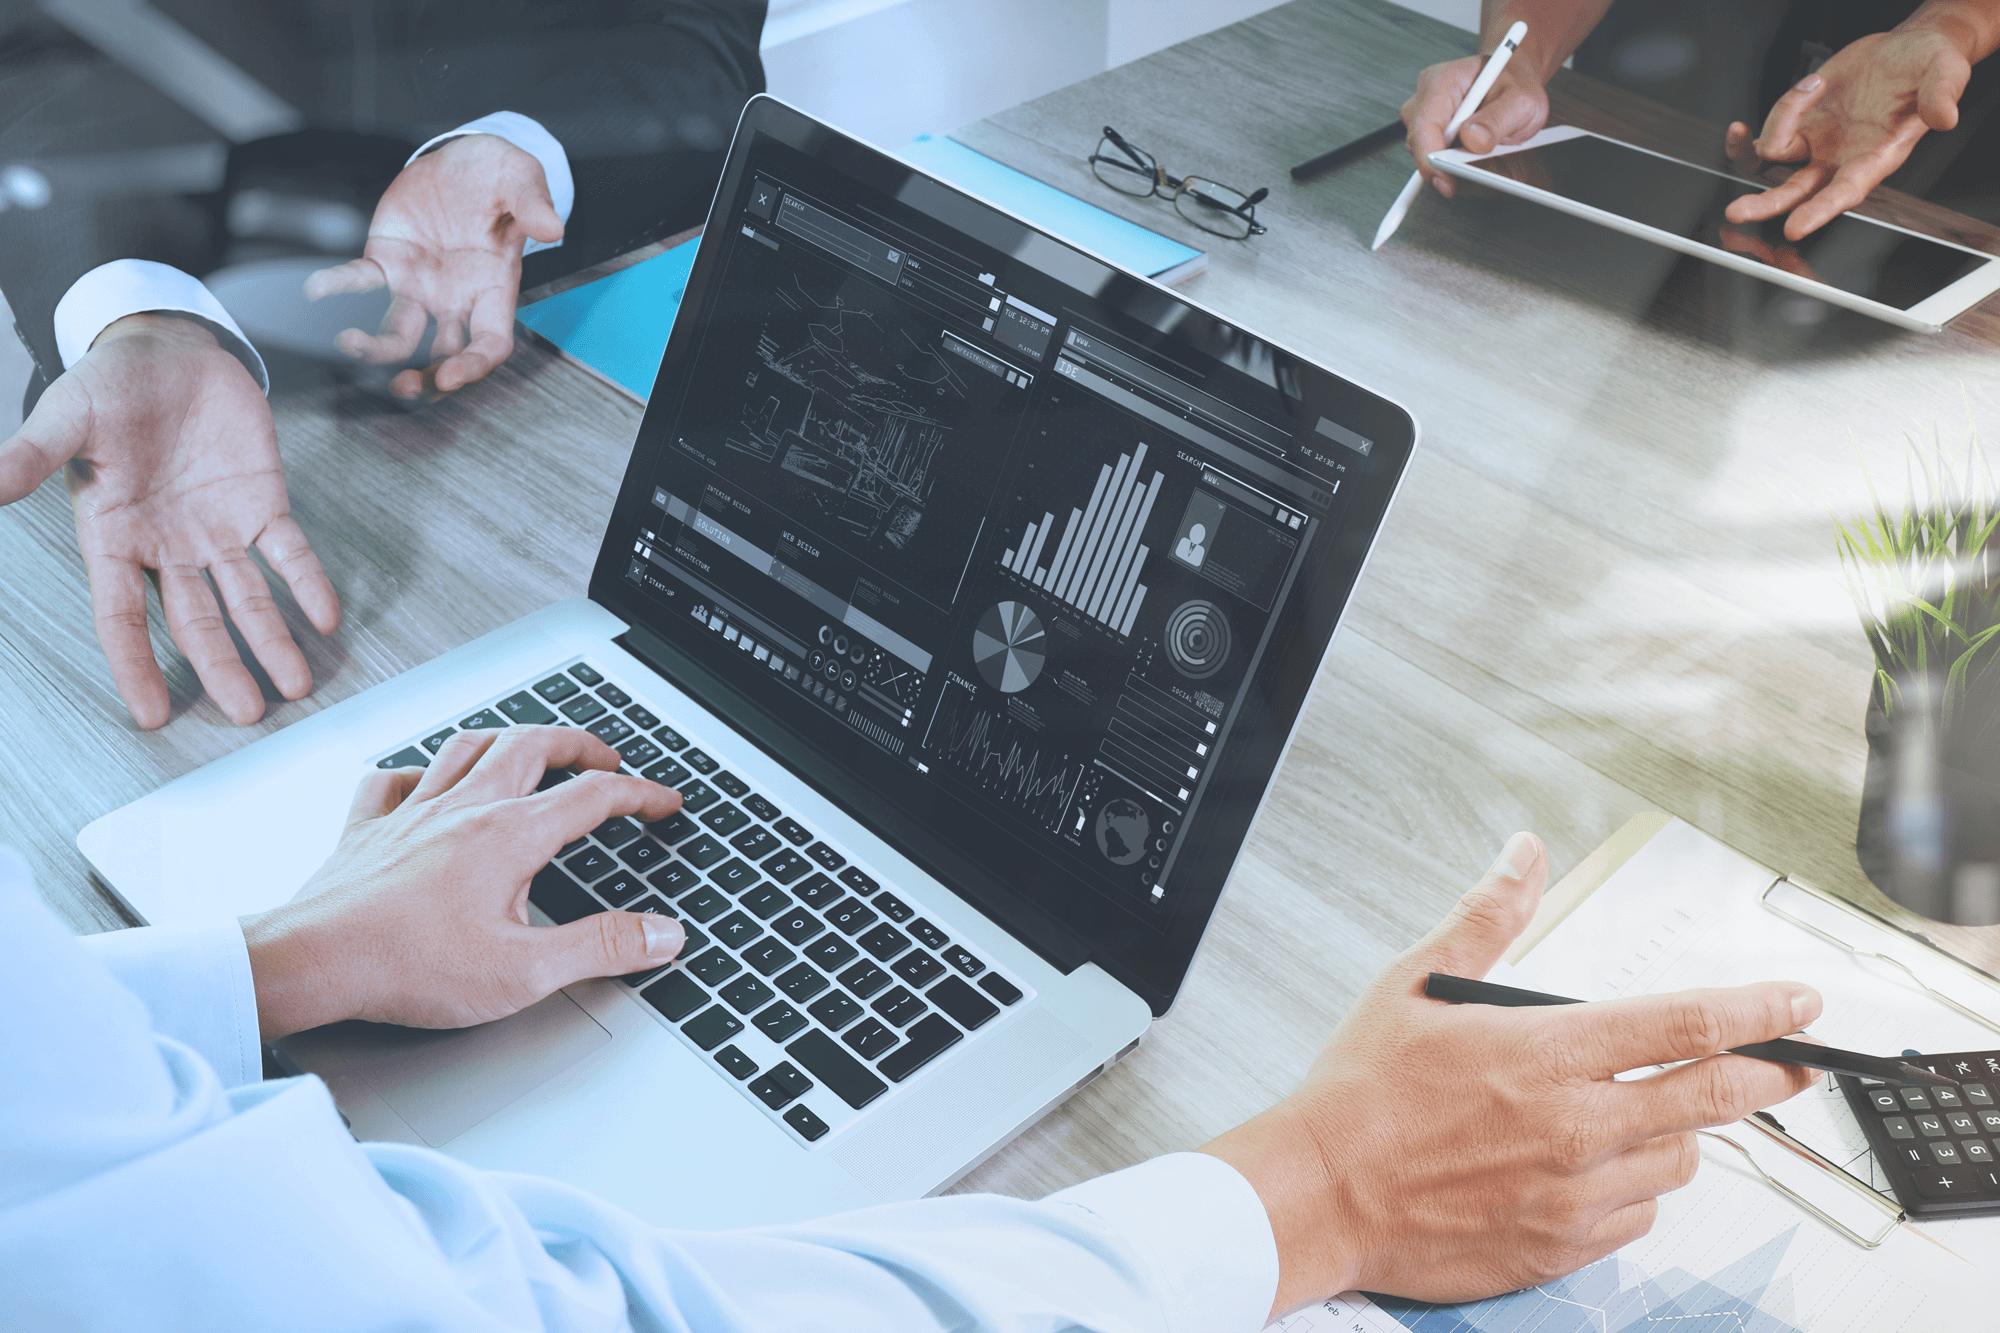 Hergebruik en een Business Intelligence framework